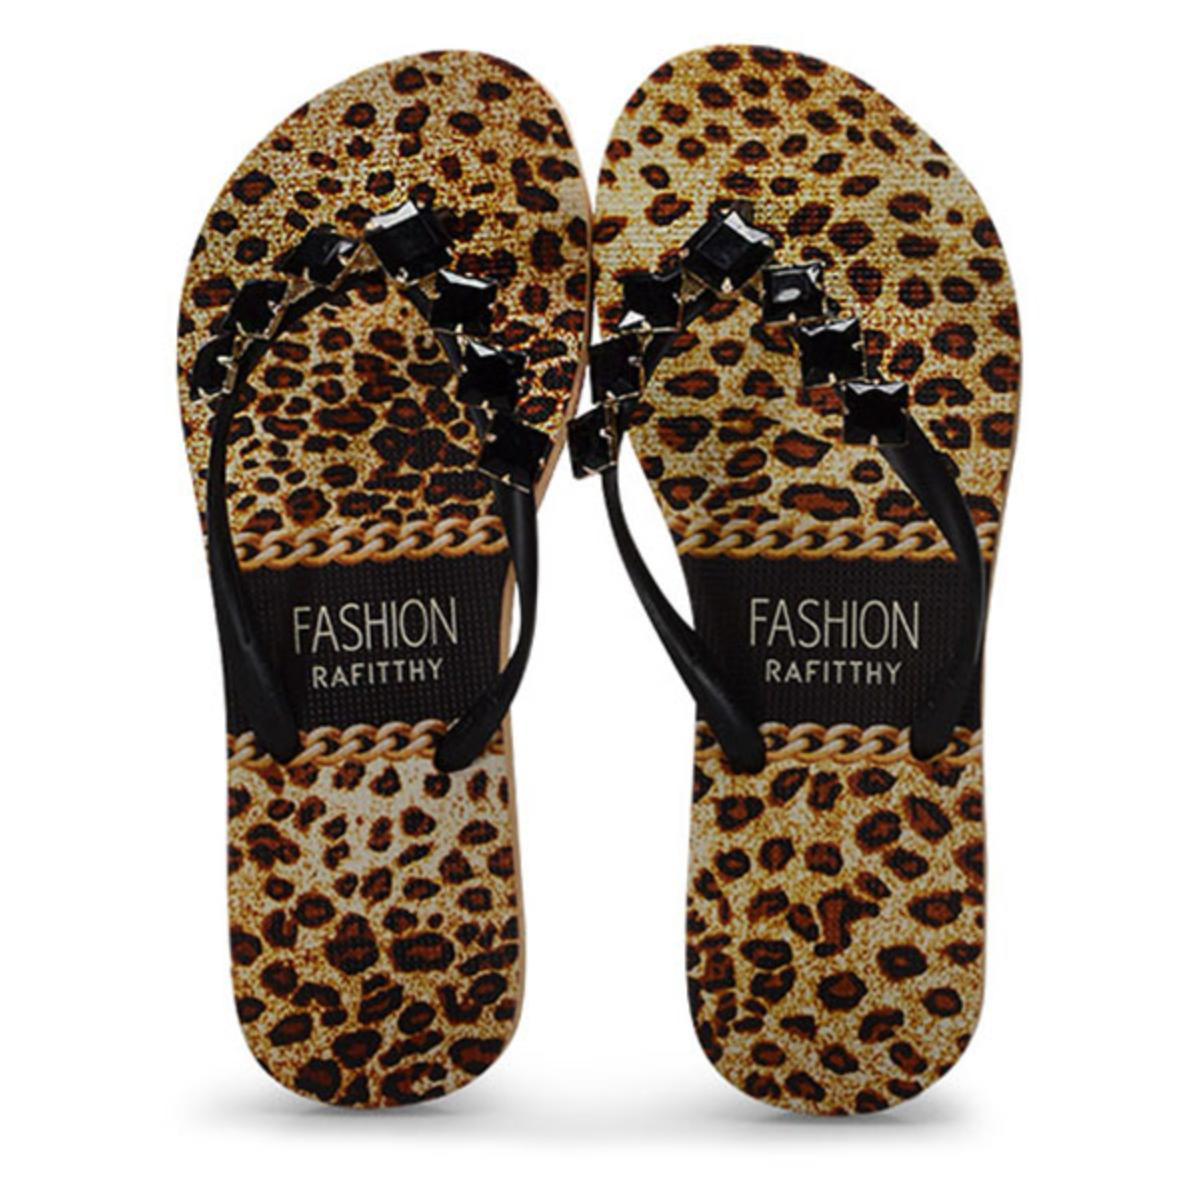 Chinelo Feminino Rafitthy 226.01704 Fashion Onca